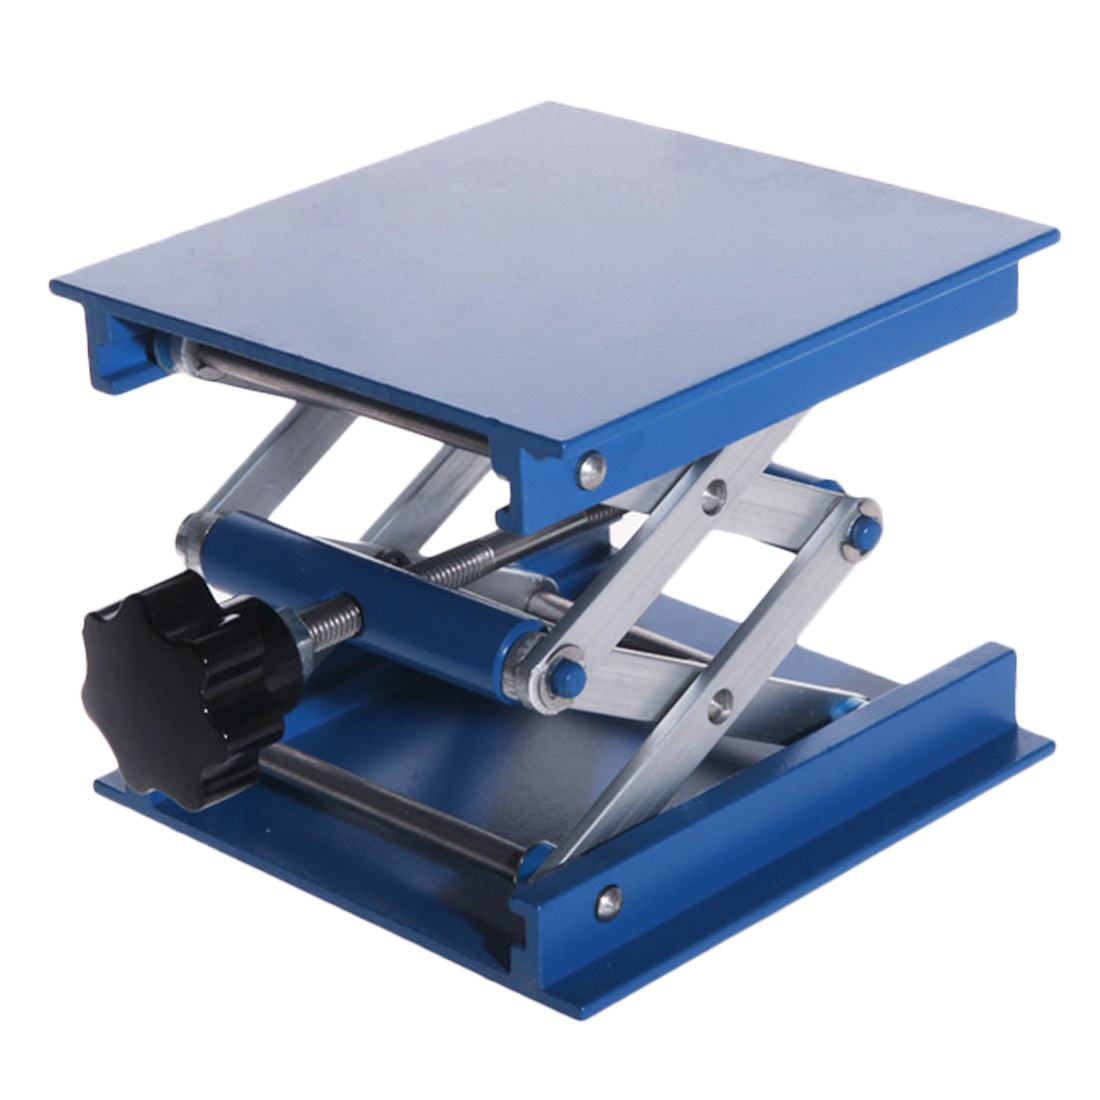 Adjustable 4X4'' Aluminum Oxide Laboratory Lab-Lift Lifting Platforms Lab Scissor Stand Rack 100X100X150mm